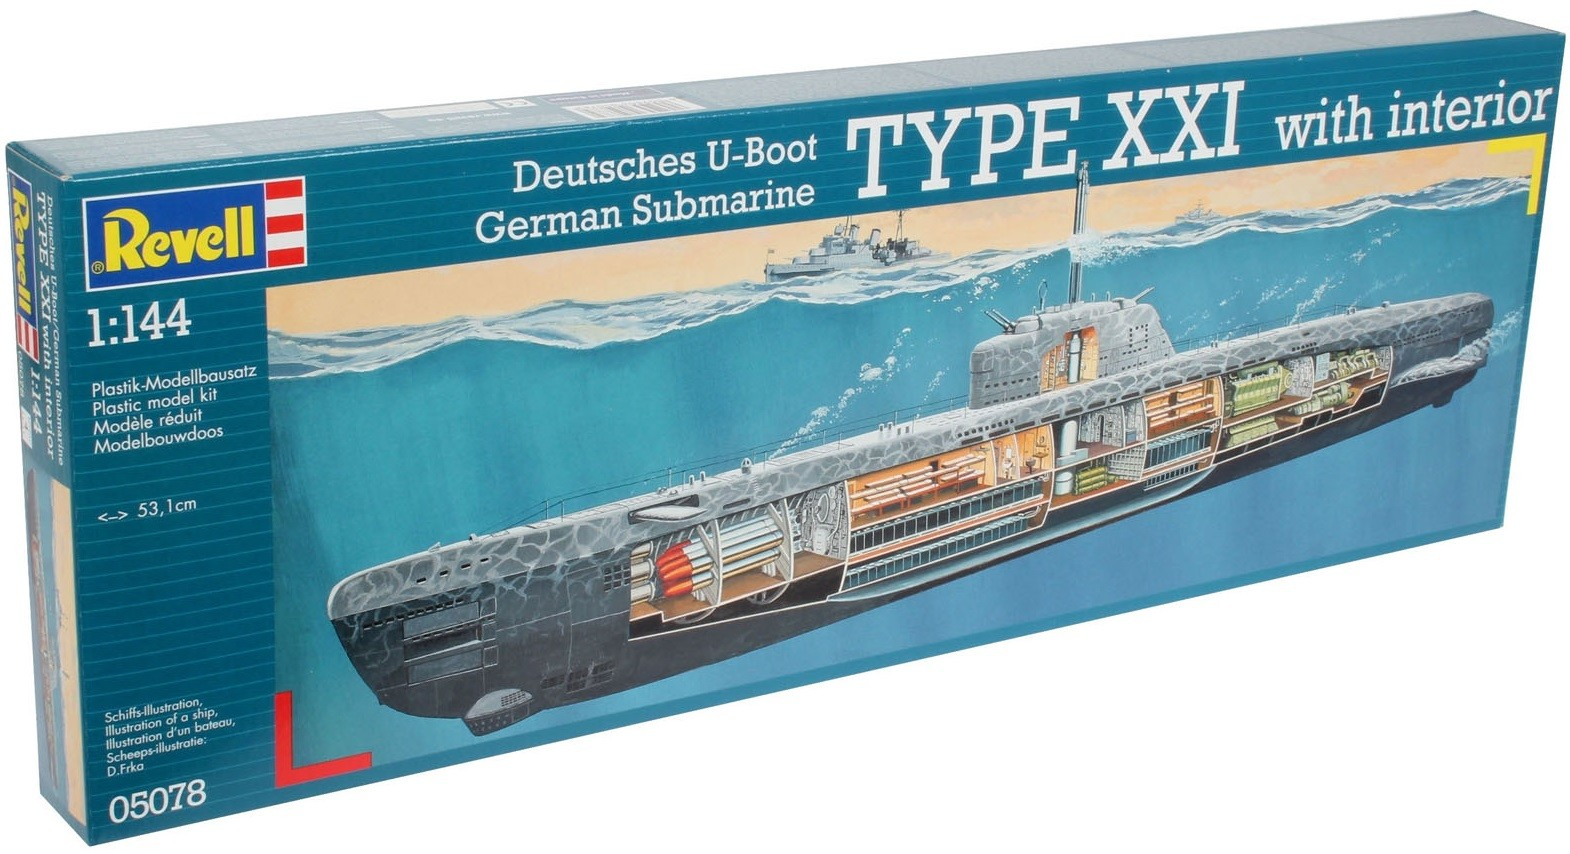 Japan style u boat xxi type w interieur articoli da for Interieur u boat